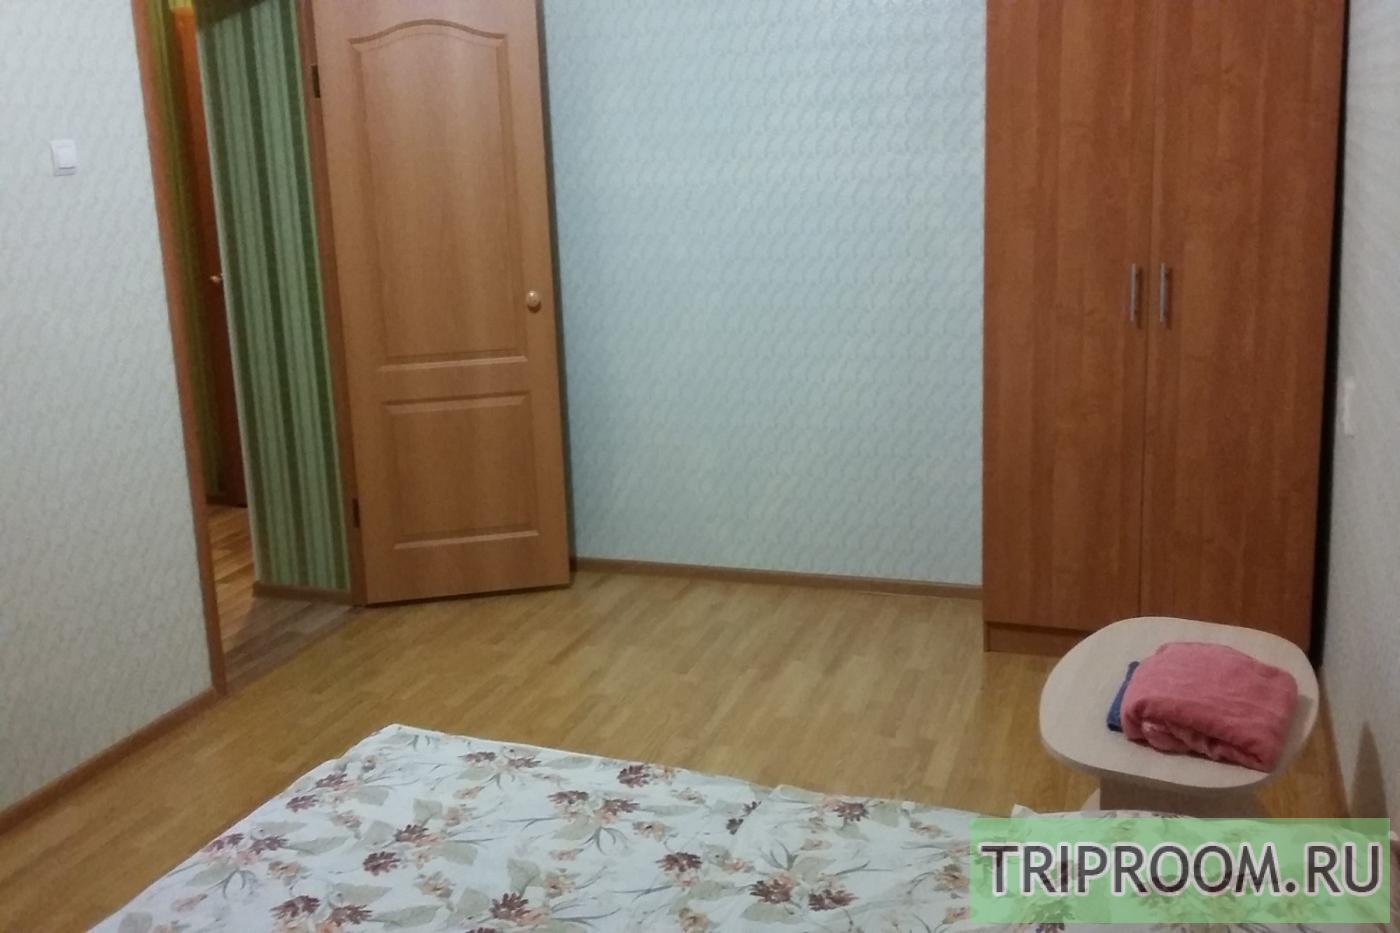 1-комнатная квартира посуточно (вариант № 29586), ул. Максима Горького улица, фото № 3